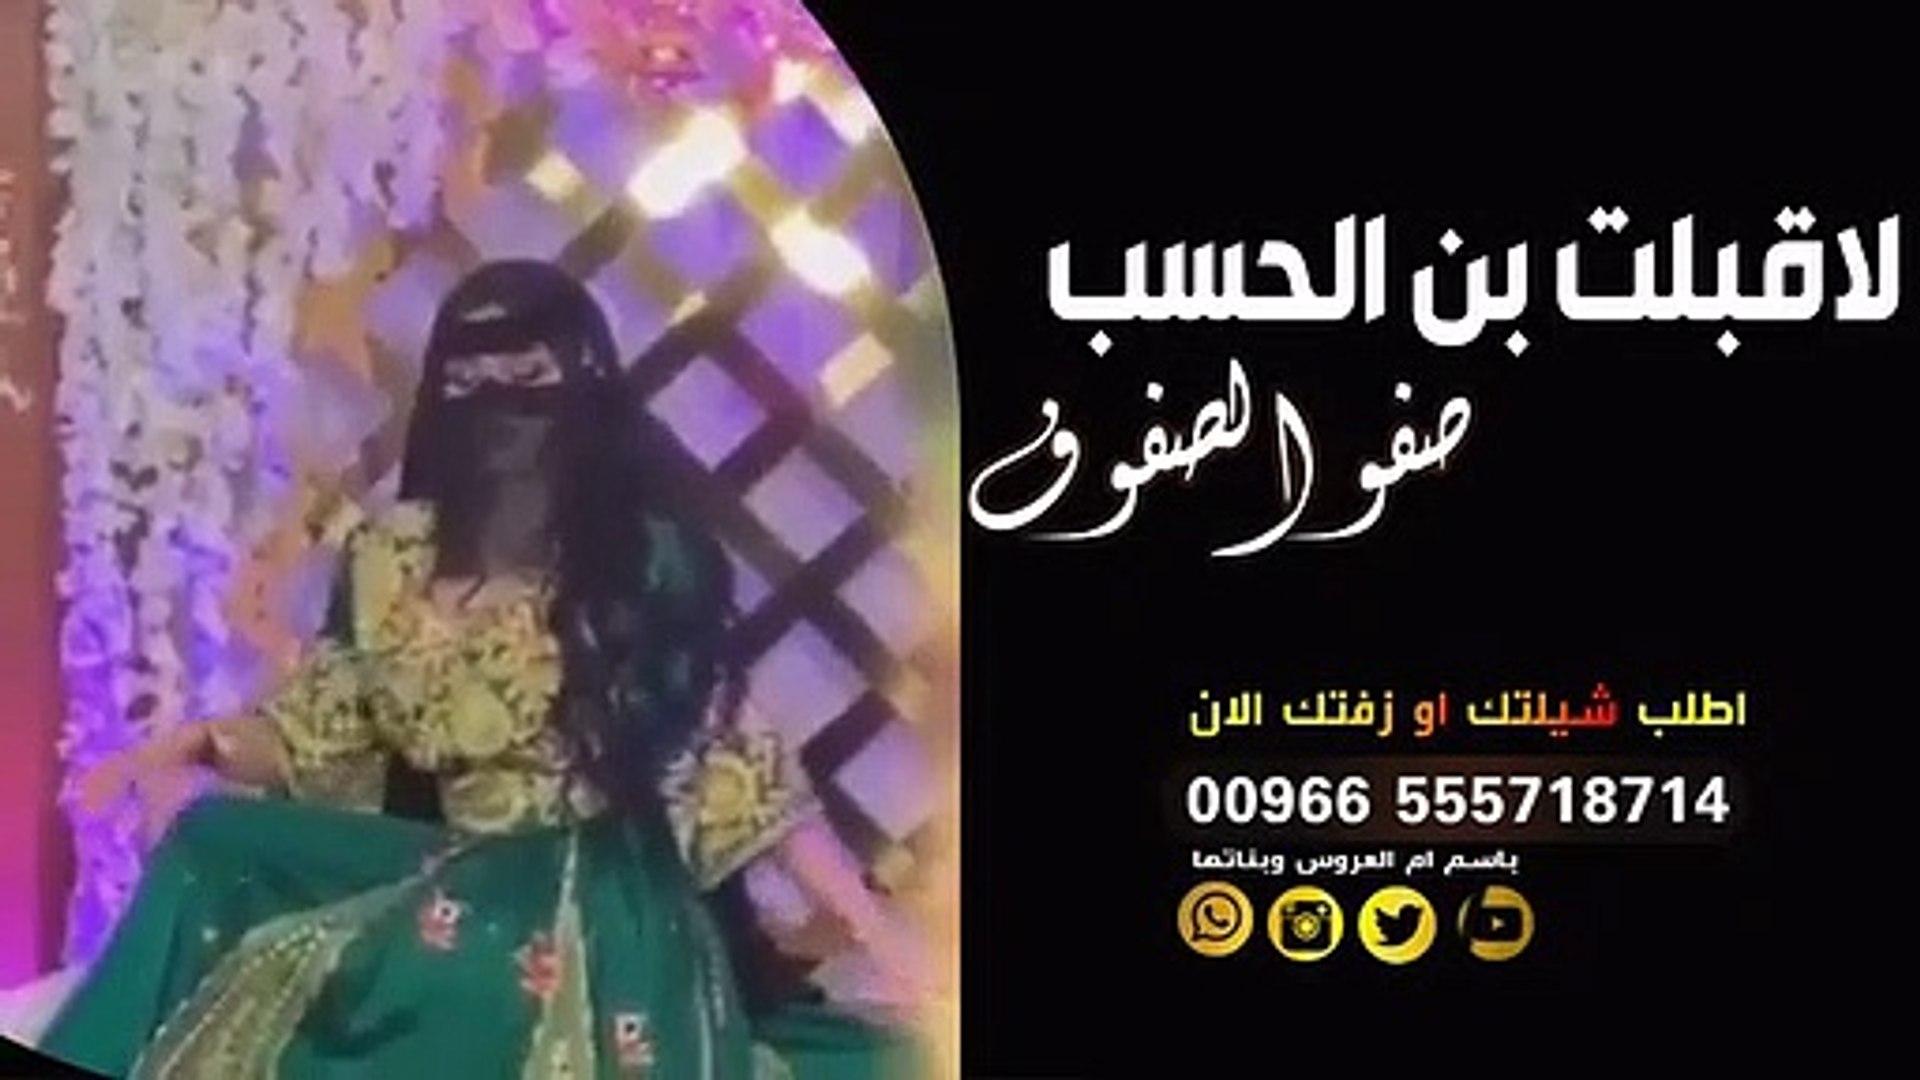 رقص بنات سعوديه عل شيلات سعوديه عراقيه 2019و♀️)ريم العبدالله . .    رقص بنات ساخن جدااااhttp://euns